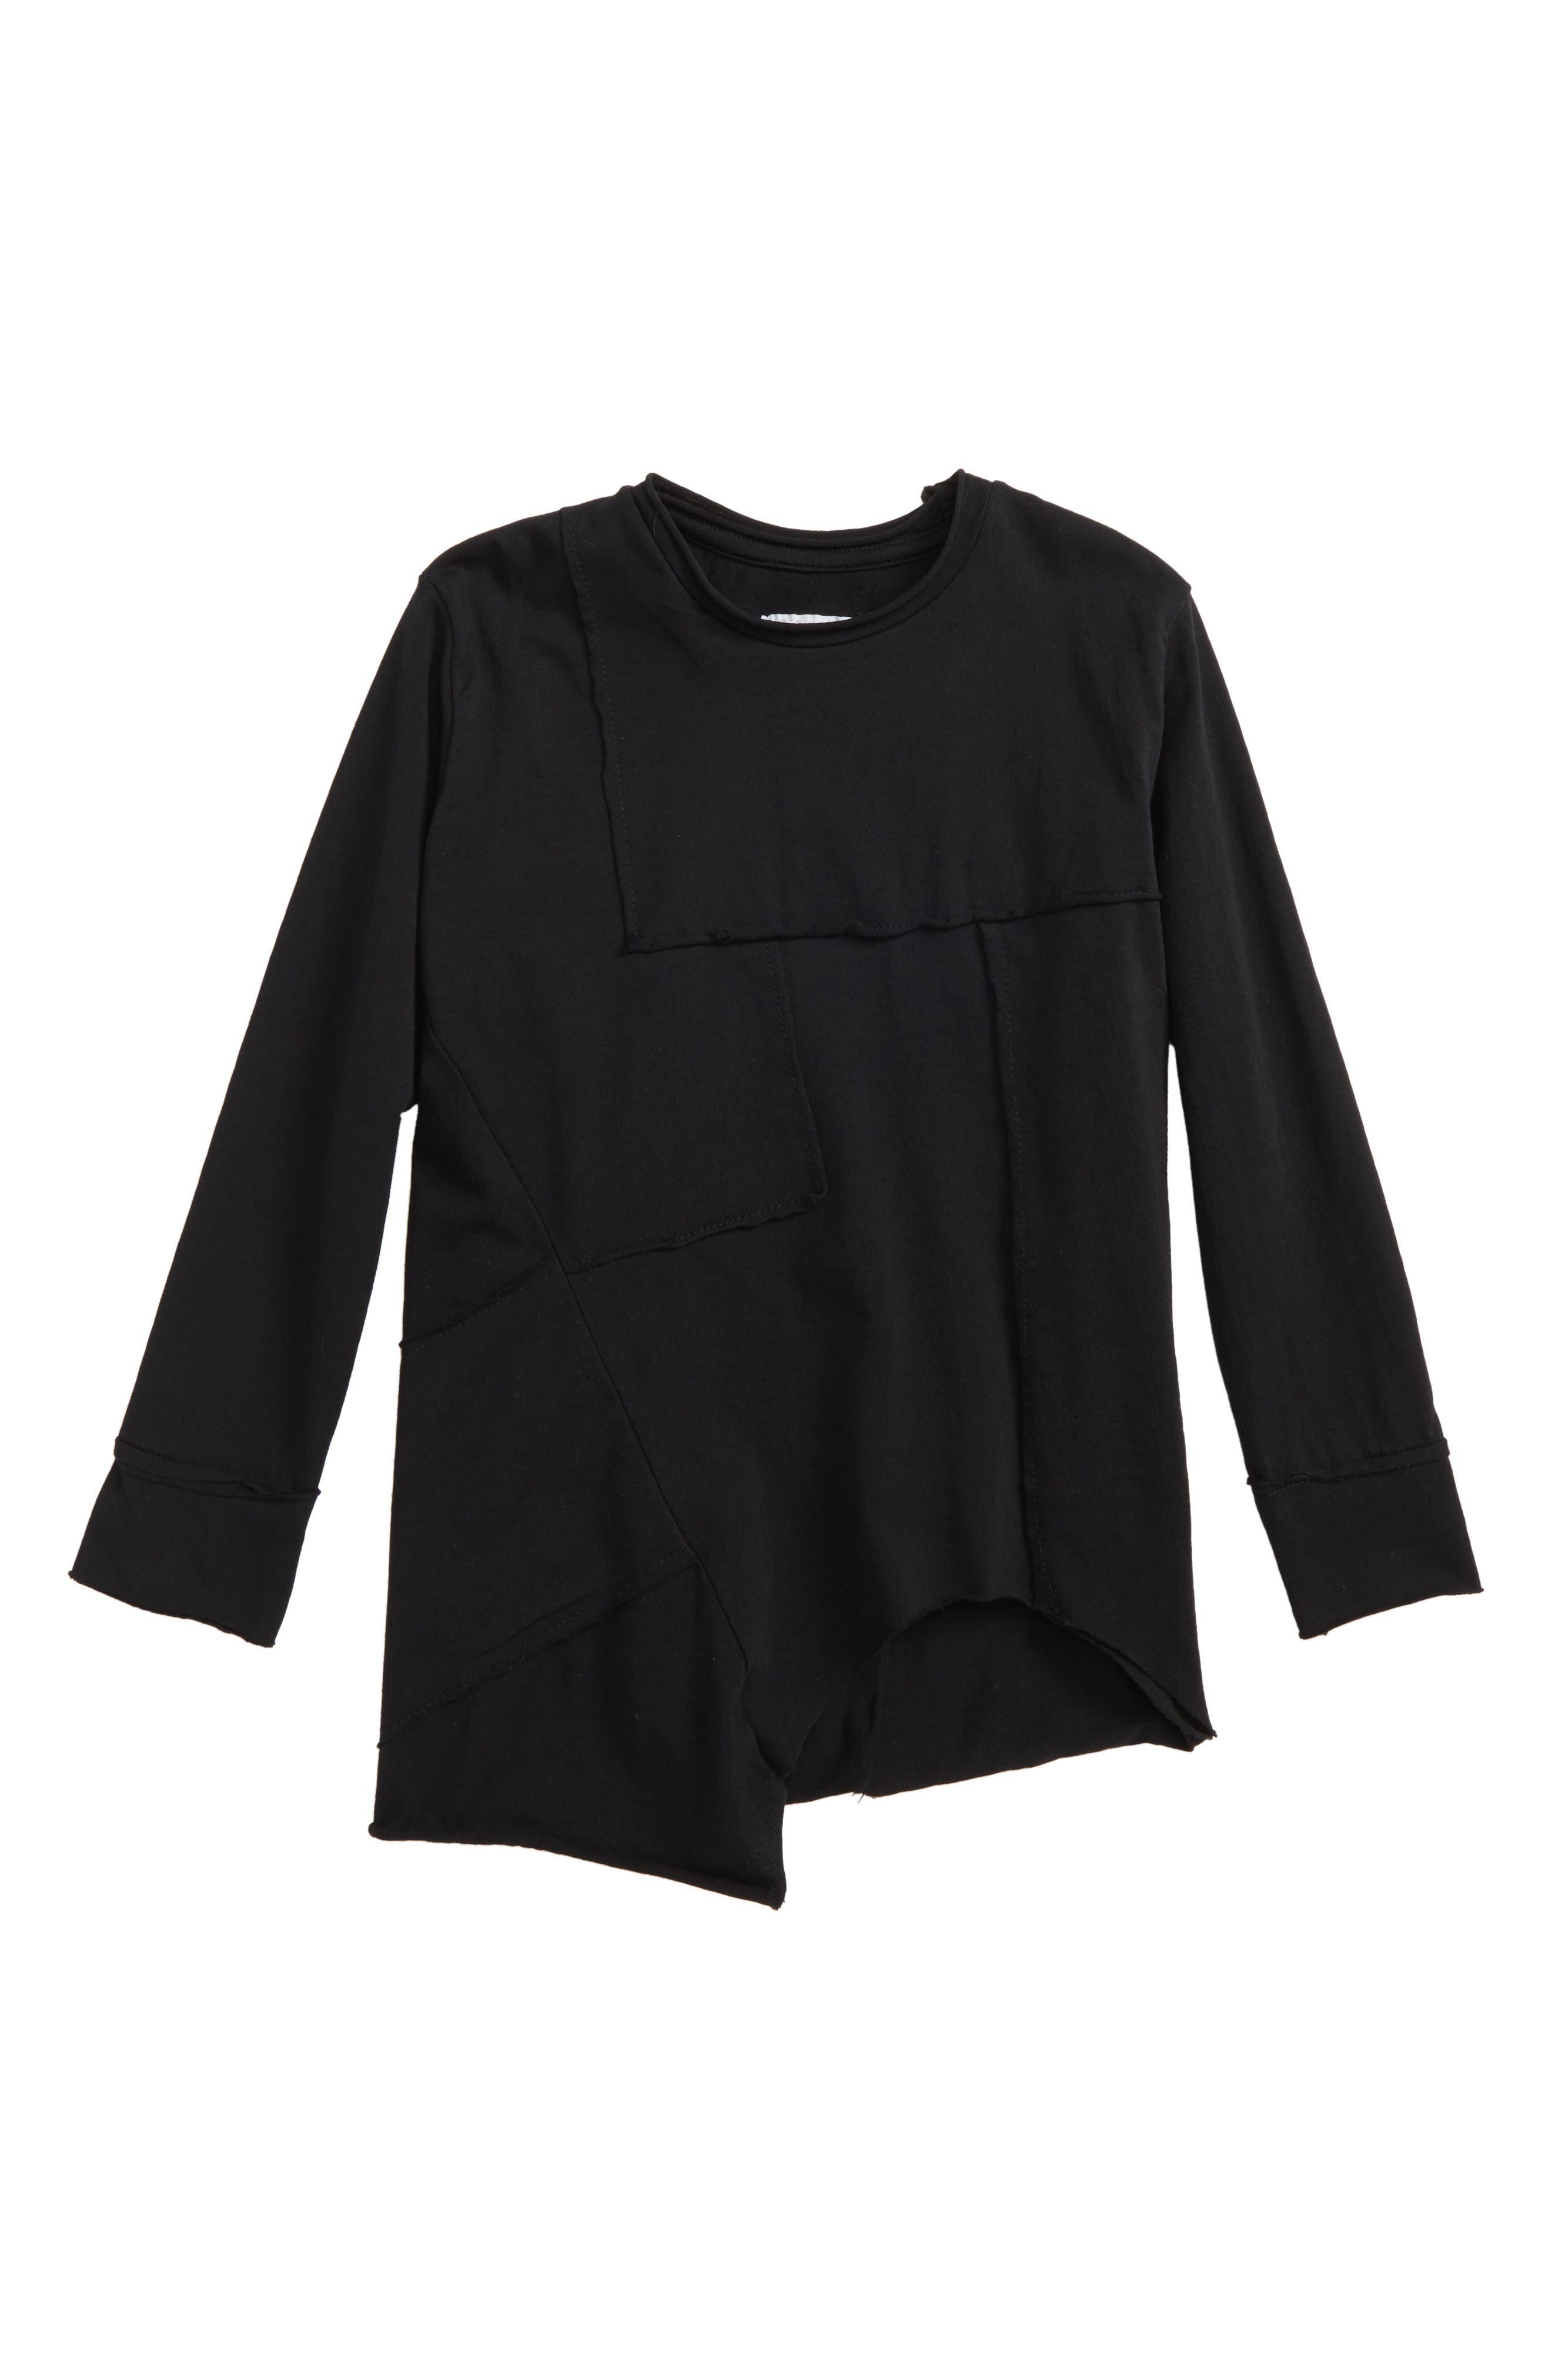 Patchwork Shirt,                             Main thumbnail 1, color,                             001